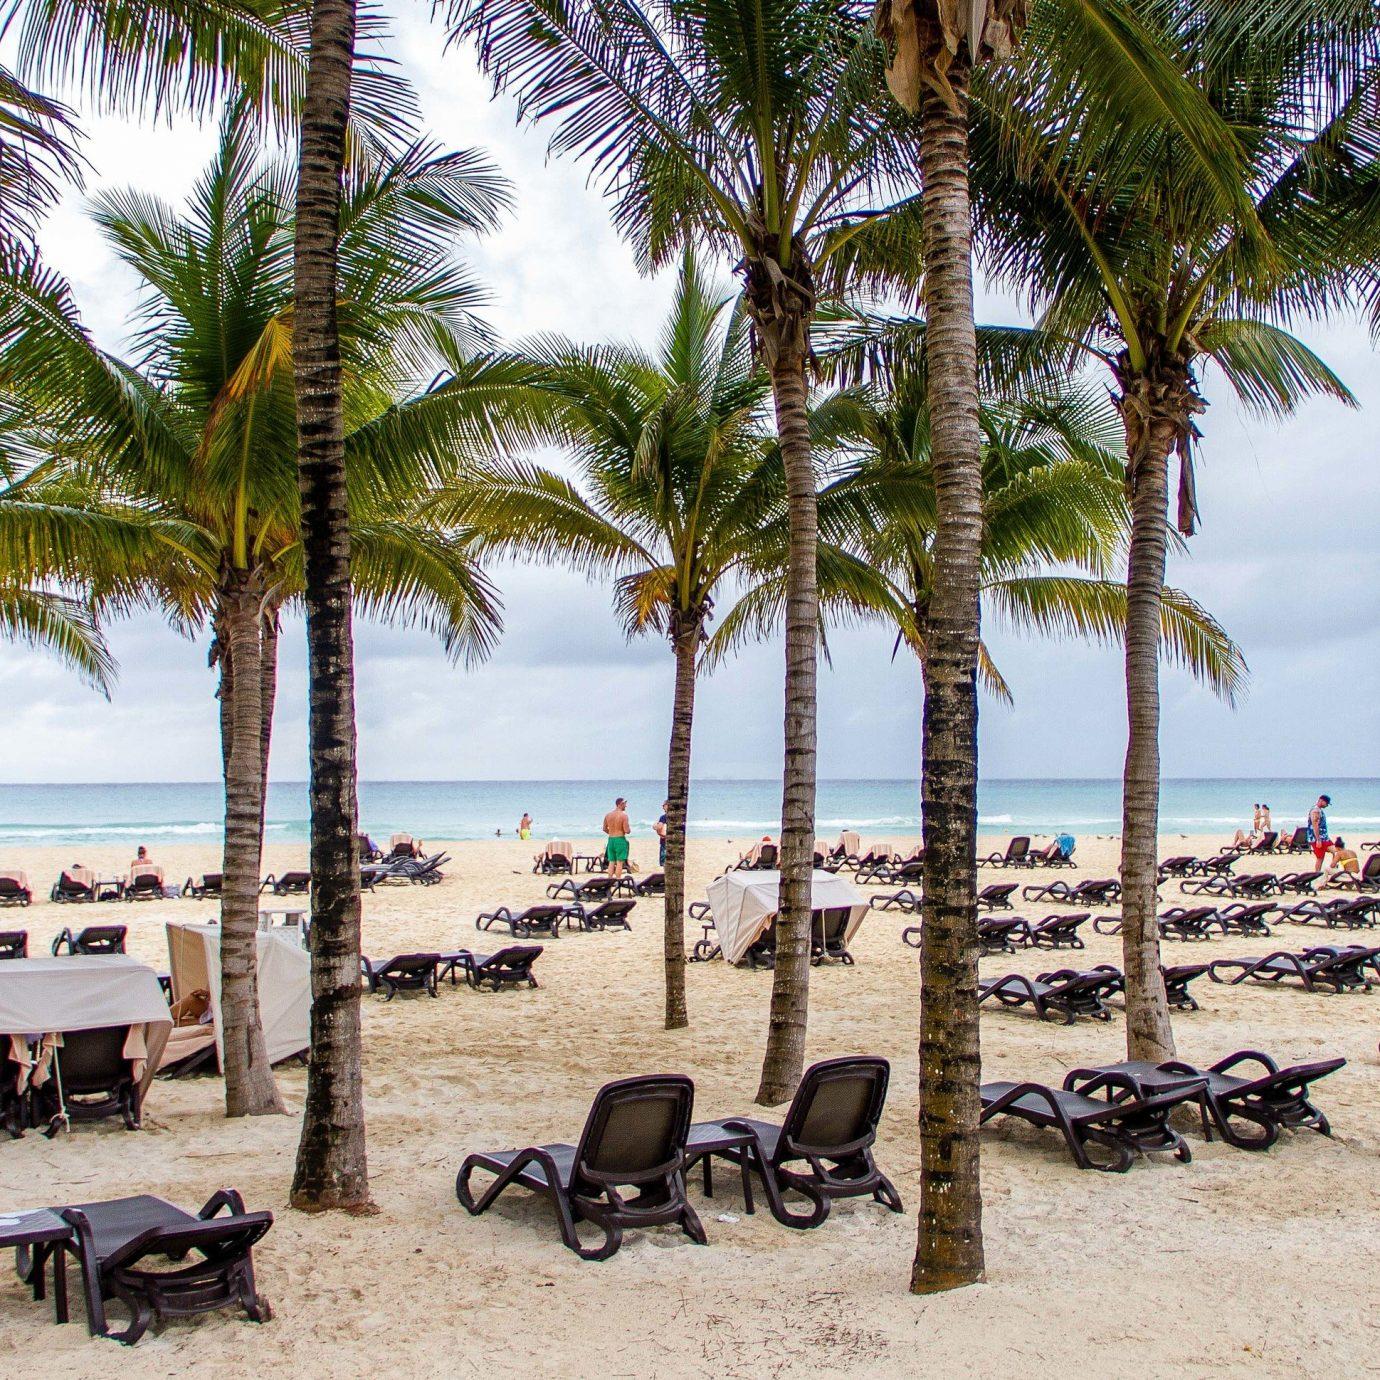 All-inclusive All-Inclusive Resorts Mexico Riviera Maya, Mexico Beach arecales palm tree tree Resort tropics shore plant caribbean Sea sky sand coconut